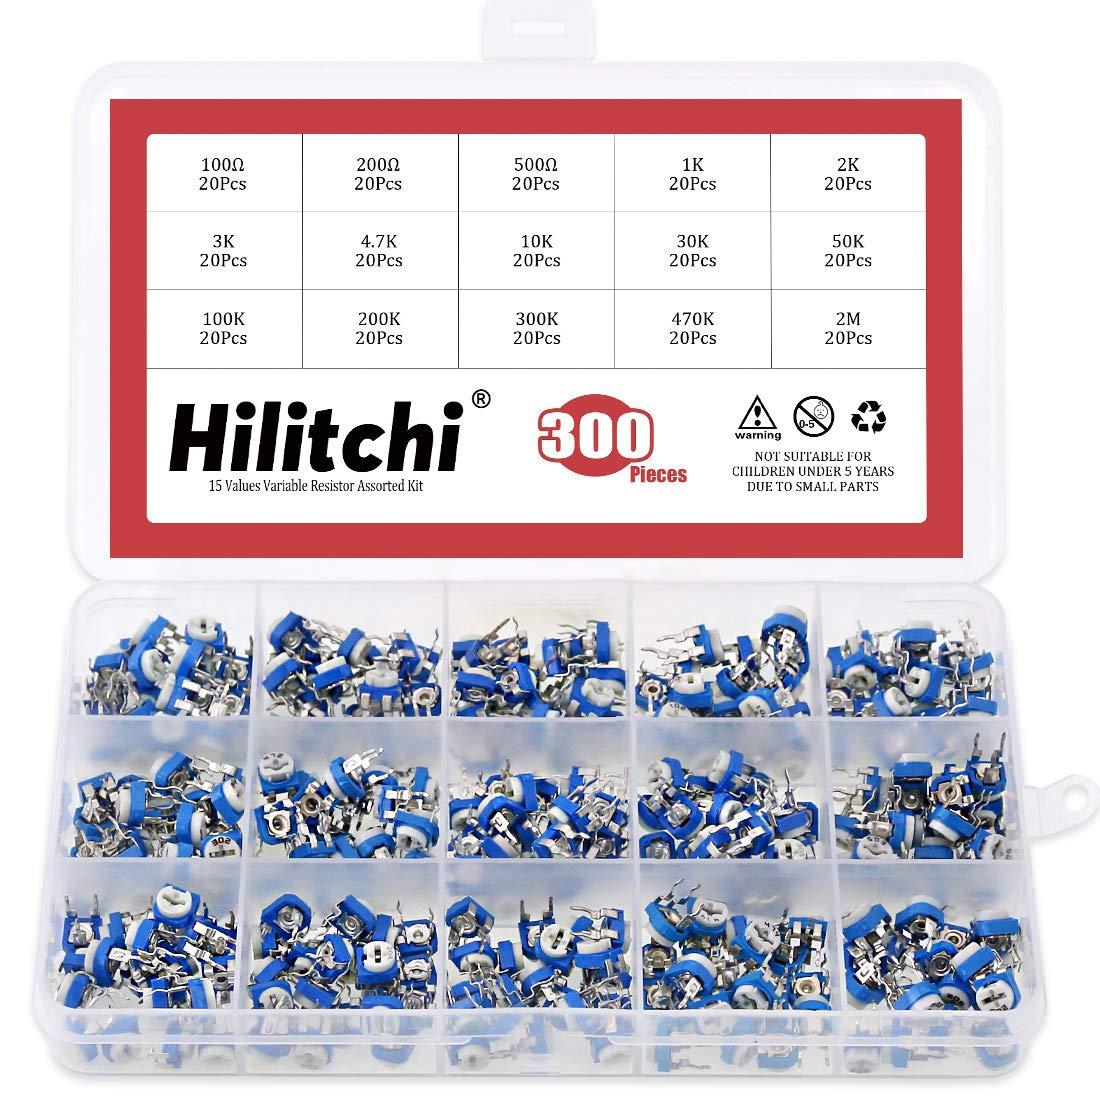 Hilitchi 15 Value 300pcs Variable Resistor Assorted Kit Circuit Diagram Potentiometer Industrial Scientific